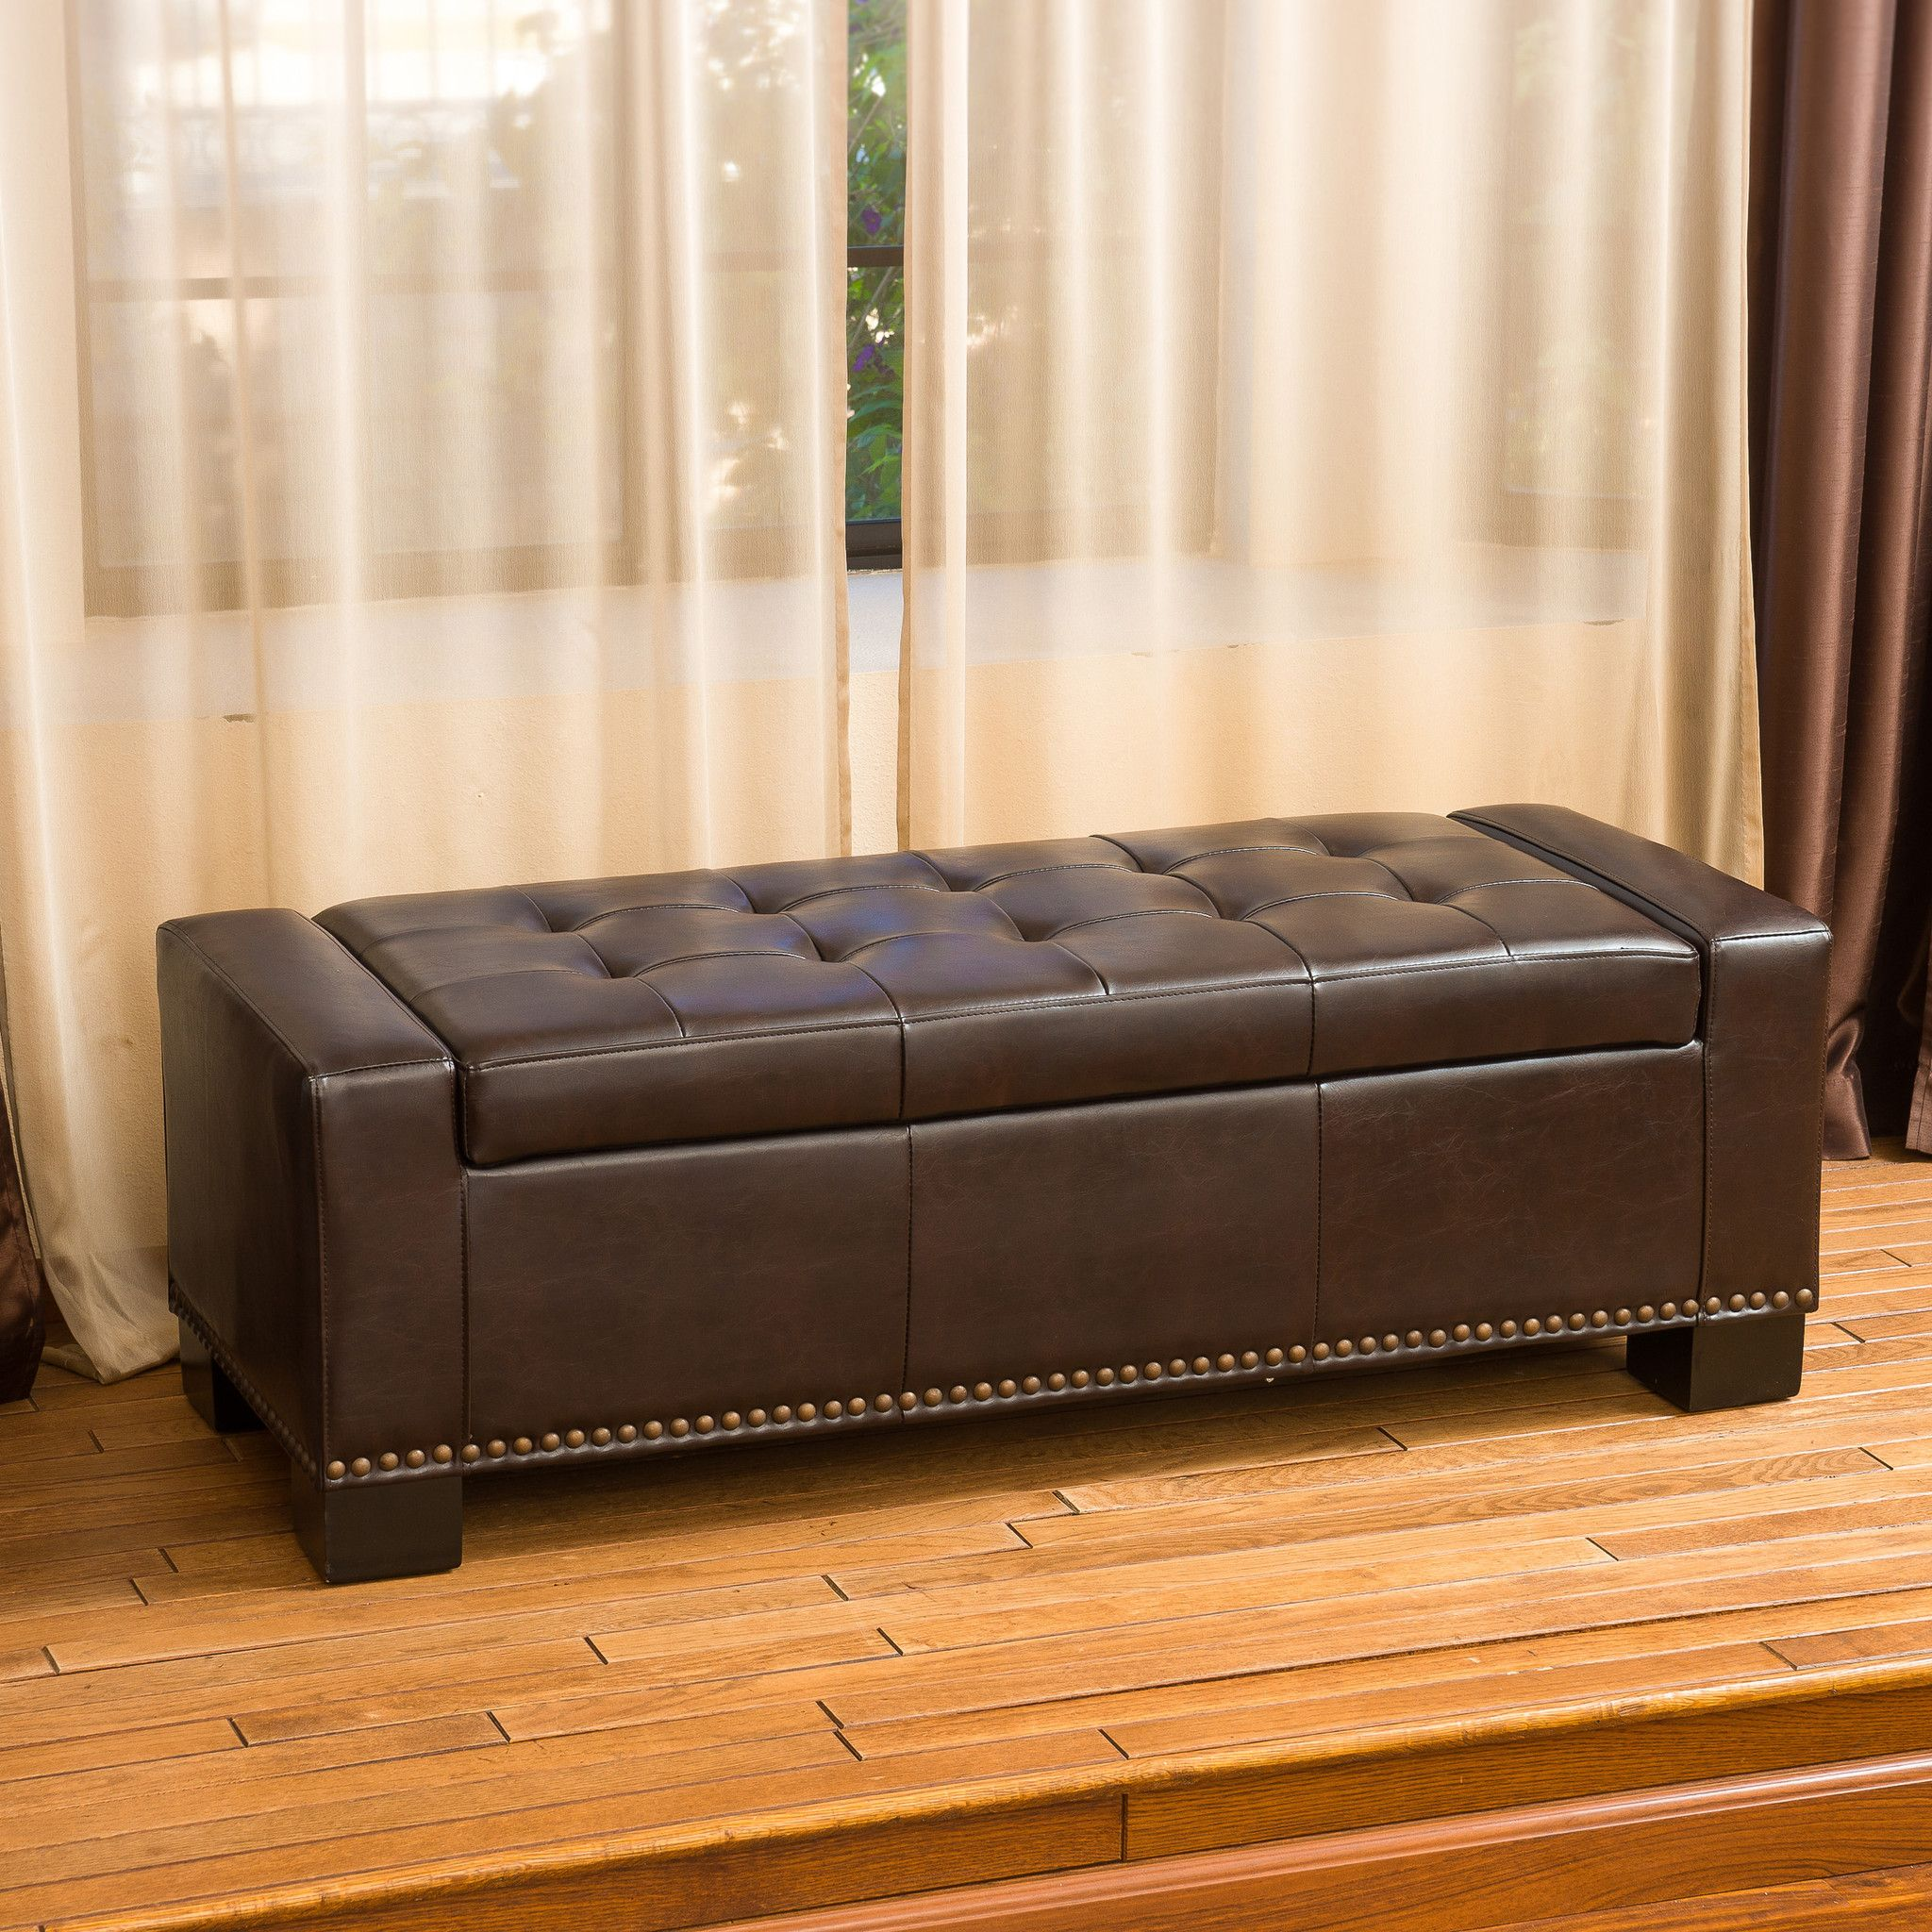 Renata Brown Leather Storage Ottoman | Cuero, Otomanas y Almacenamiento